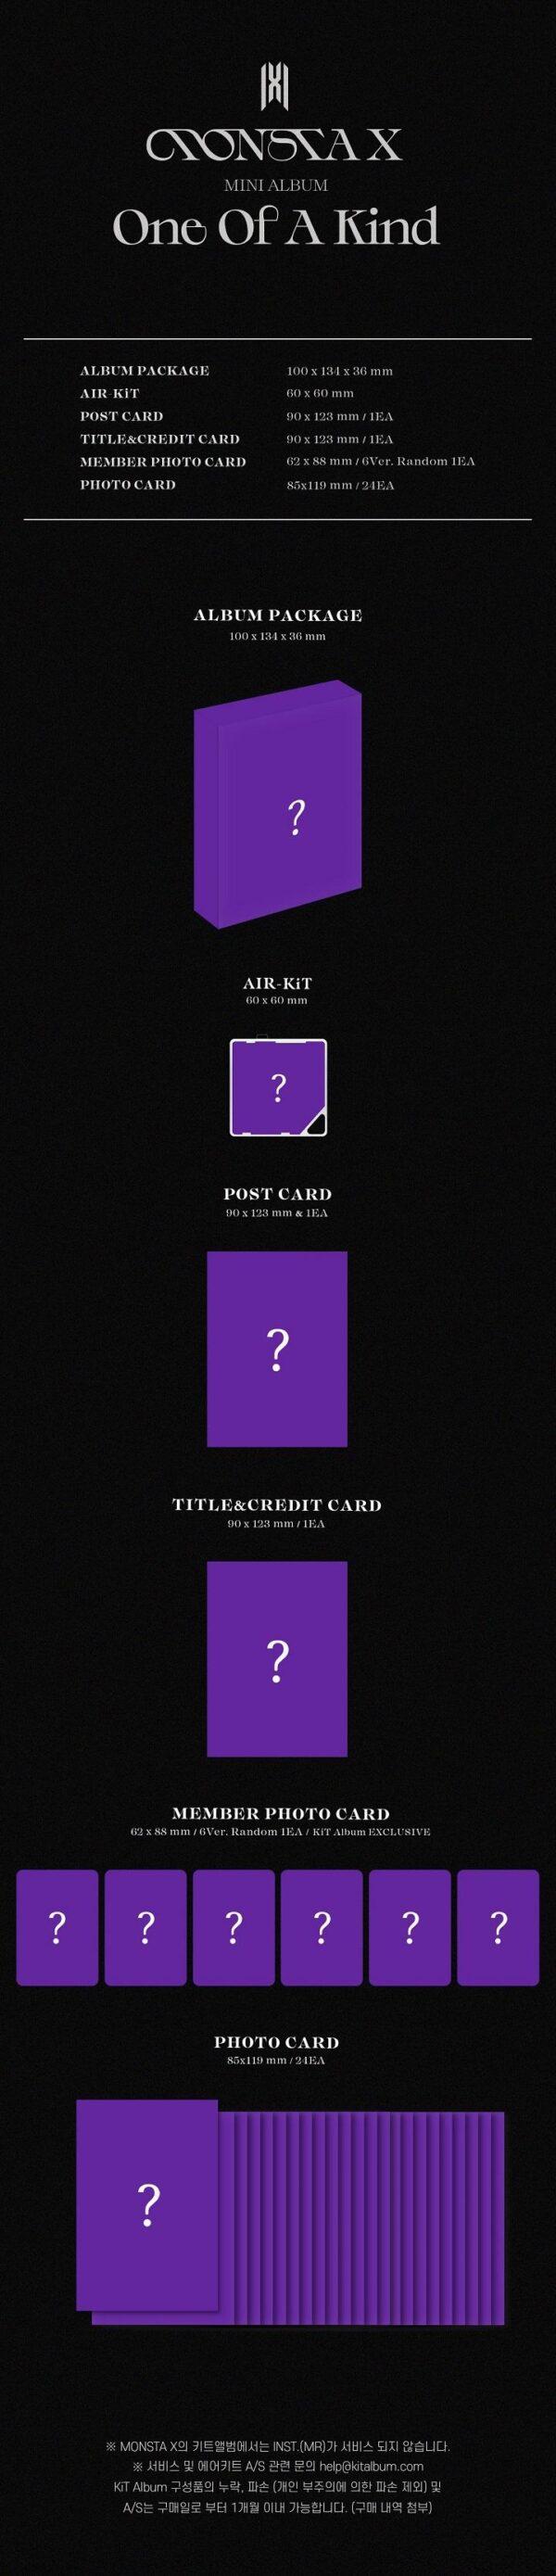 Mini Album de MONSTA X ONE OF A KIND Kit Album Ver. 1